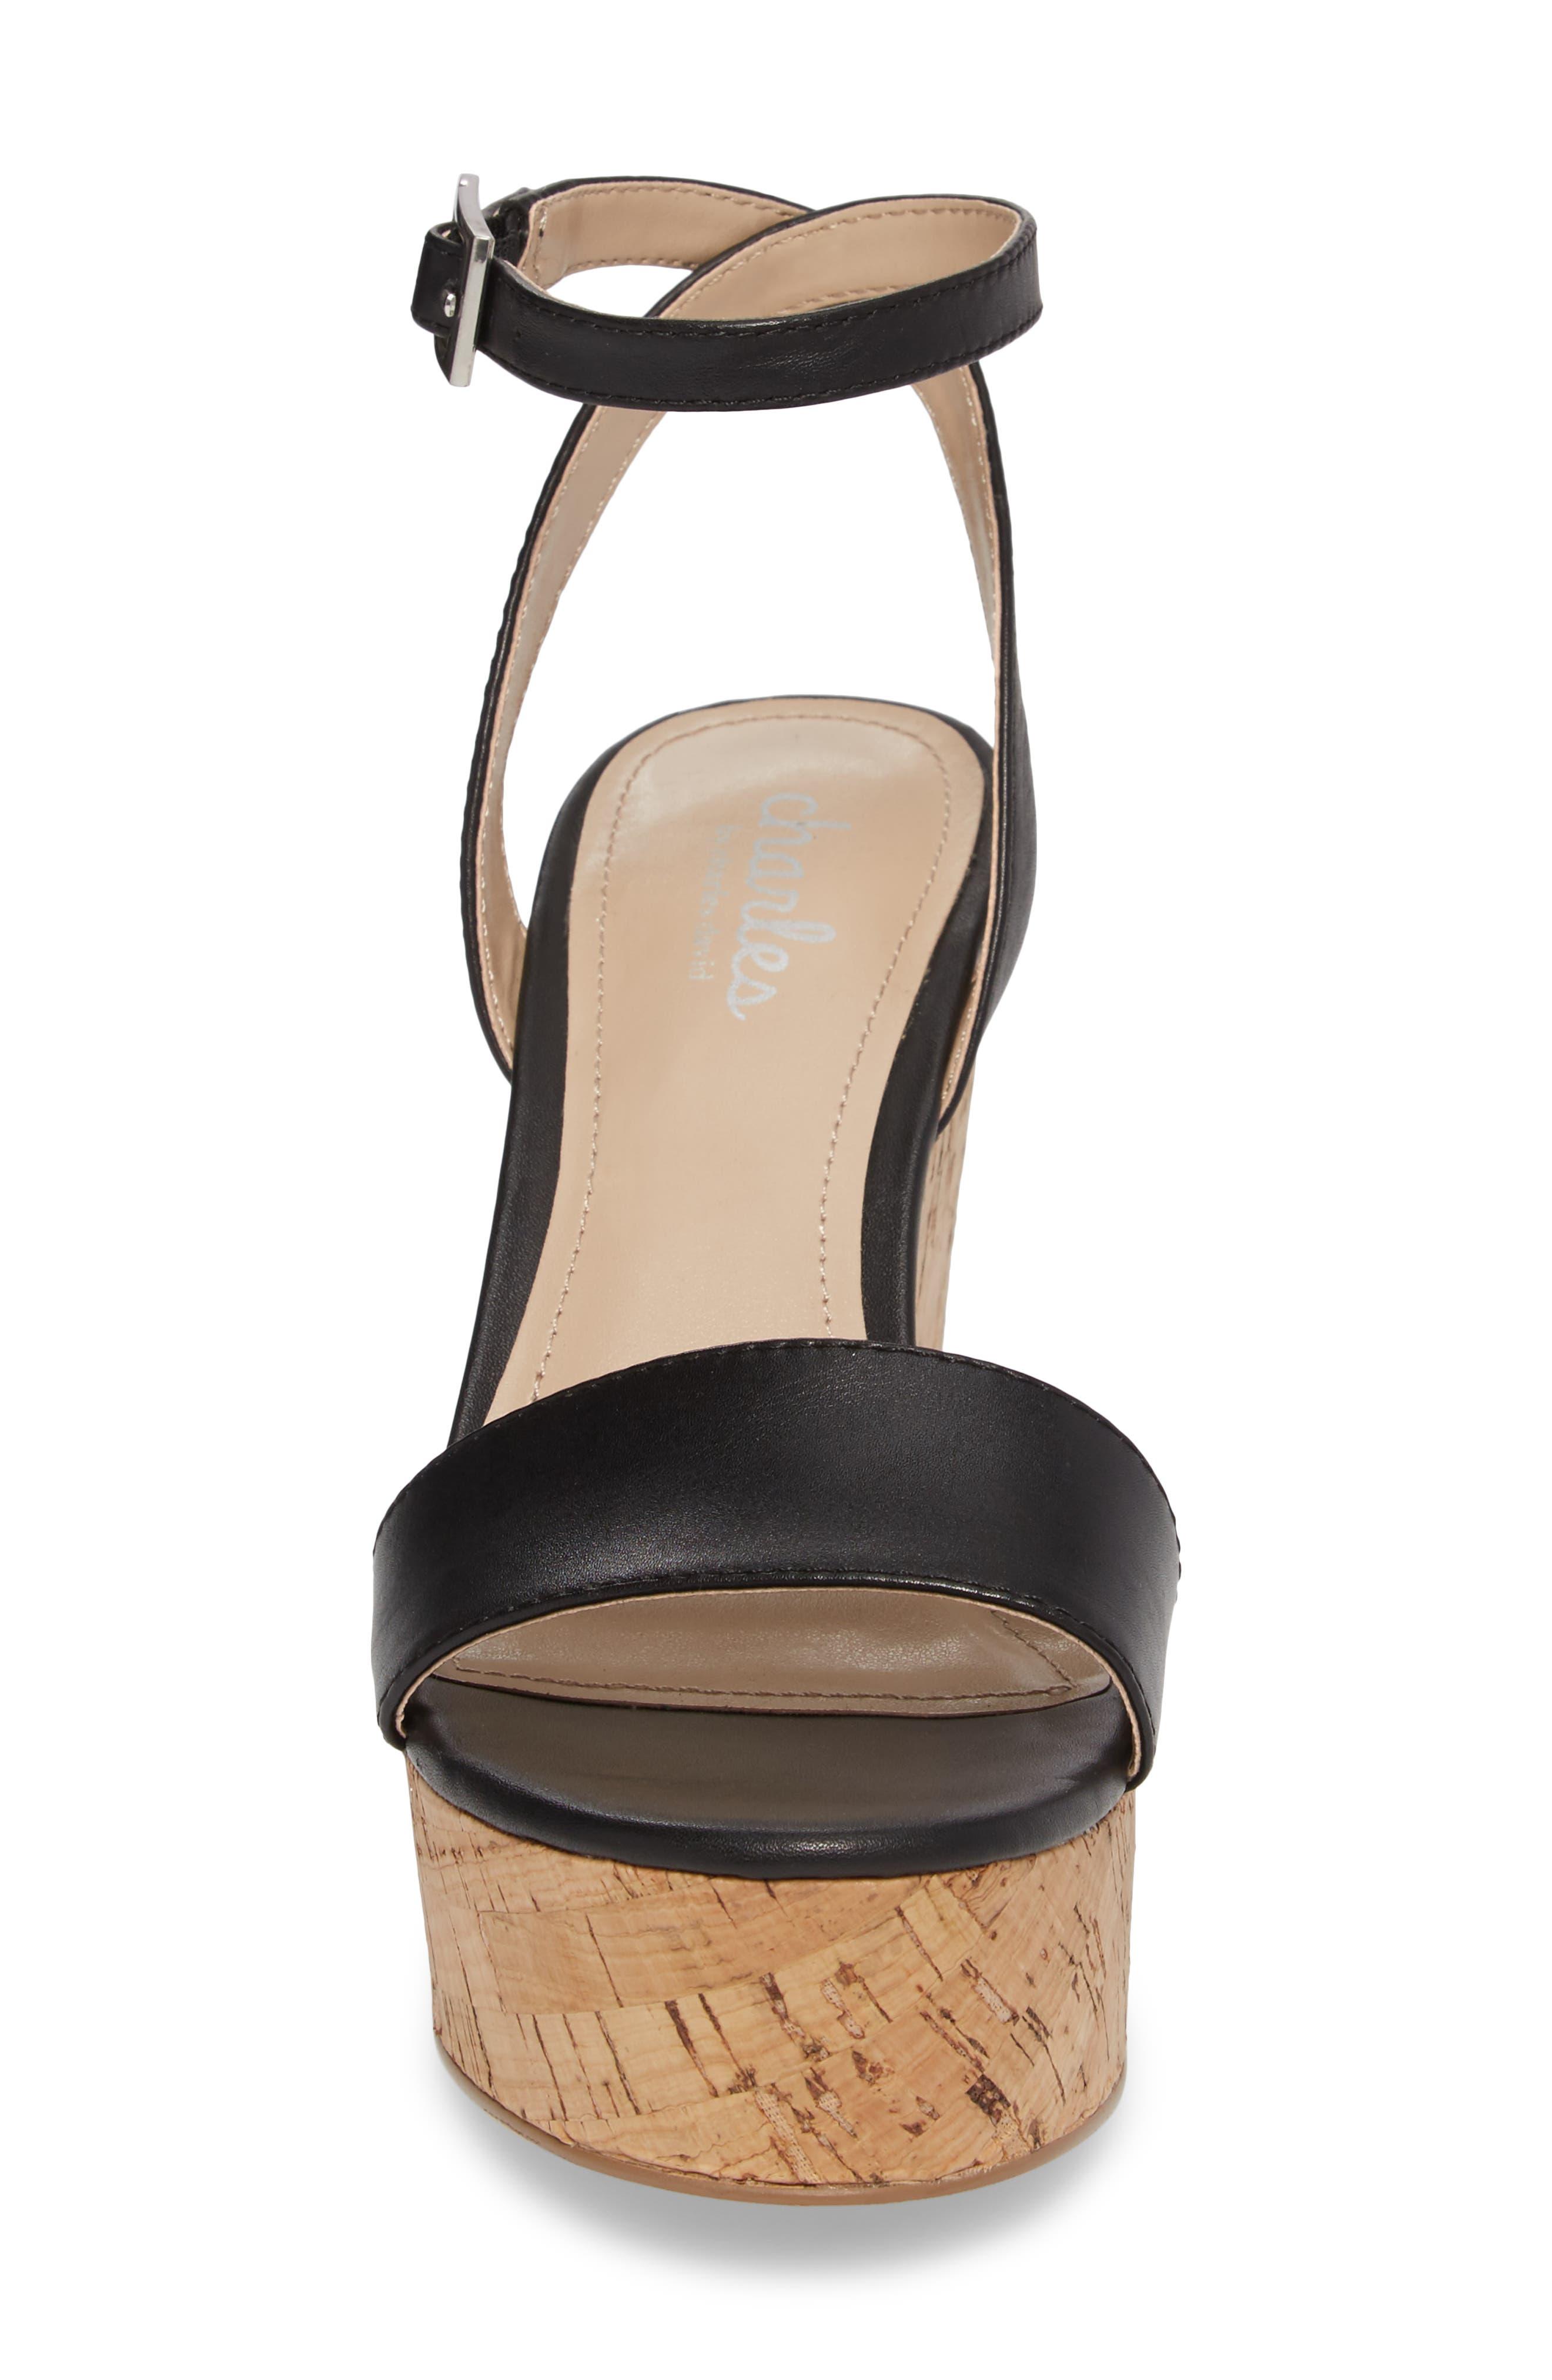 Lilla Platform Wedge Sandal,                             Alternate thumbnail 4, color,                             001